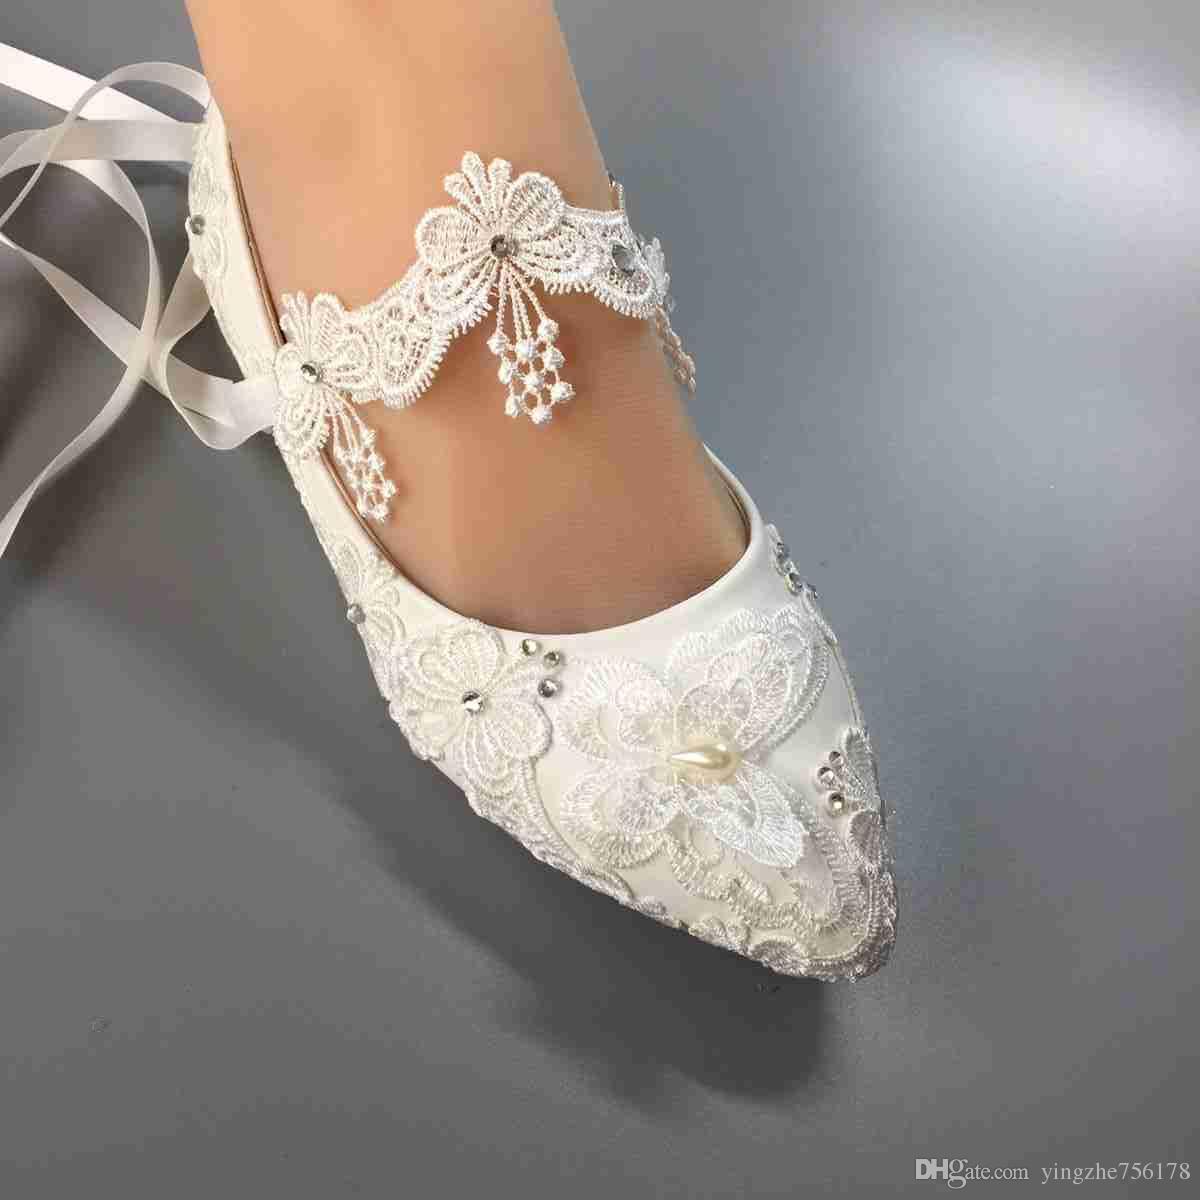 0a4b2f99a1 Compre Boda Mujer Zapatos Planos A Prueba De Agua De Encaje Blanco Novia  Vestidos De Novia HEEL Encaje De Encaje Manual De La Boda Zapatos BRIDAL  TAMAÑO UE ...